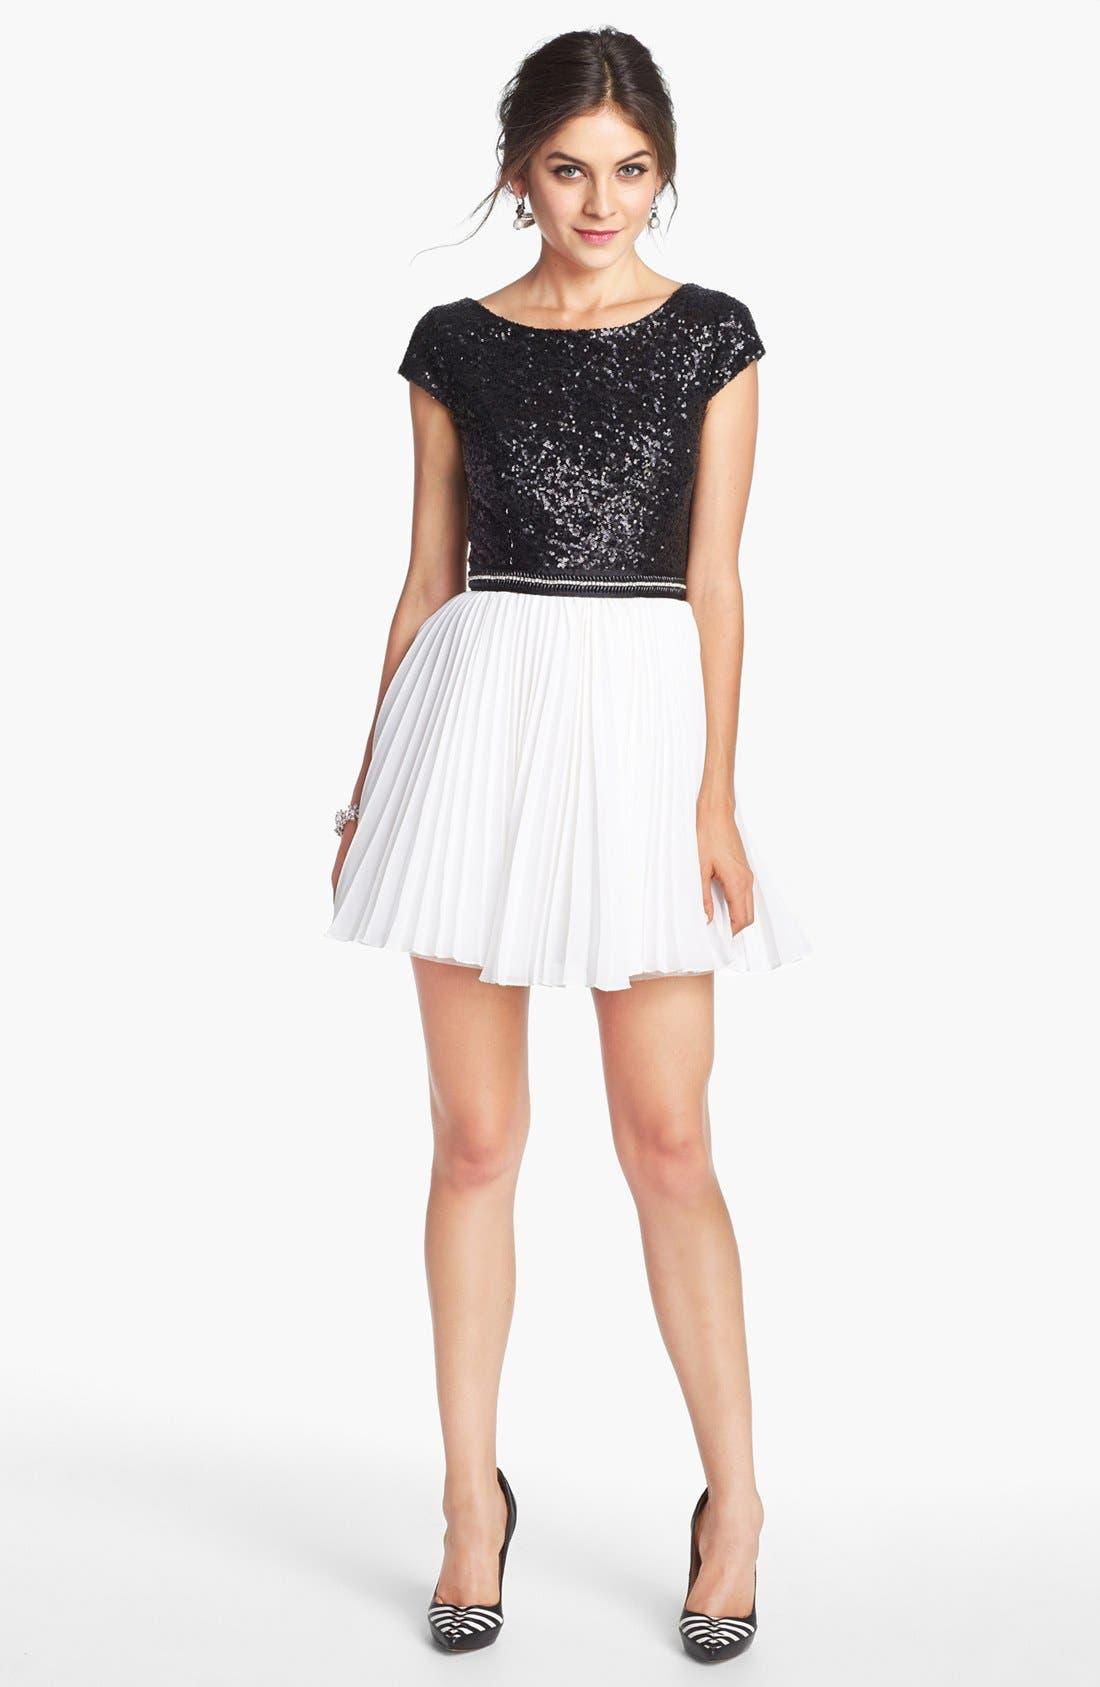 TRIXXI, Pleated Sequin Dress, Main thumbnail 1, color, 001